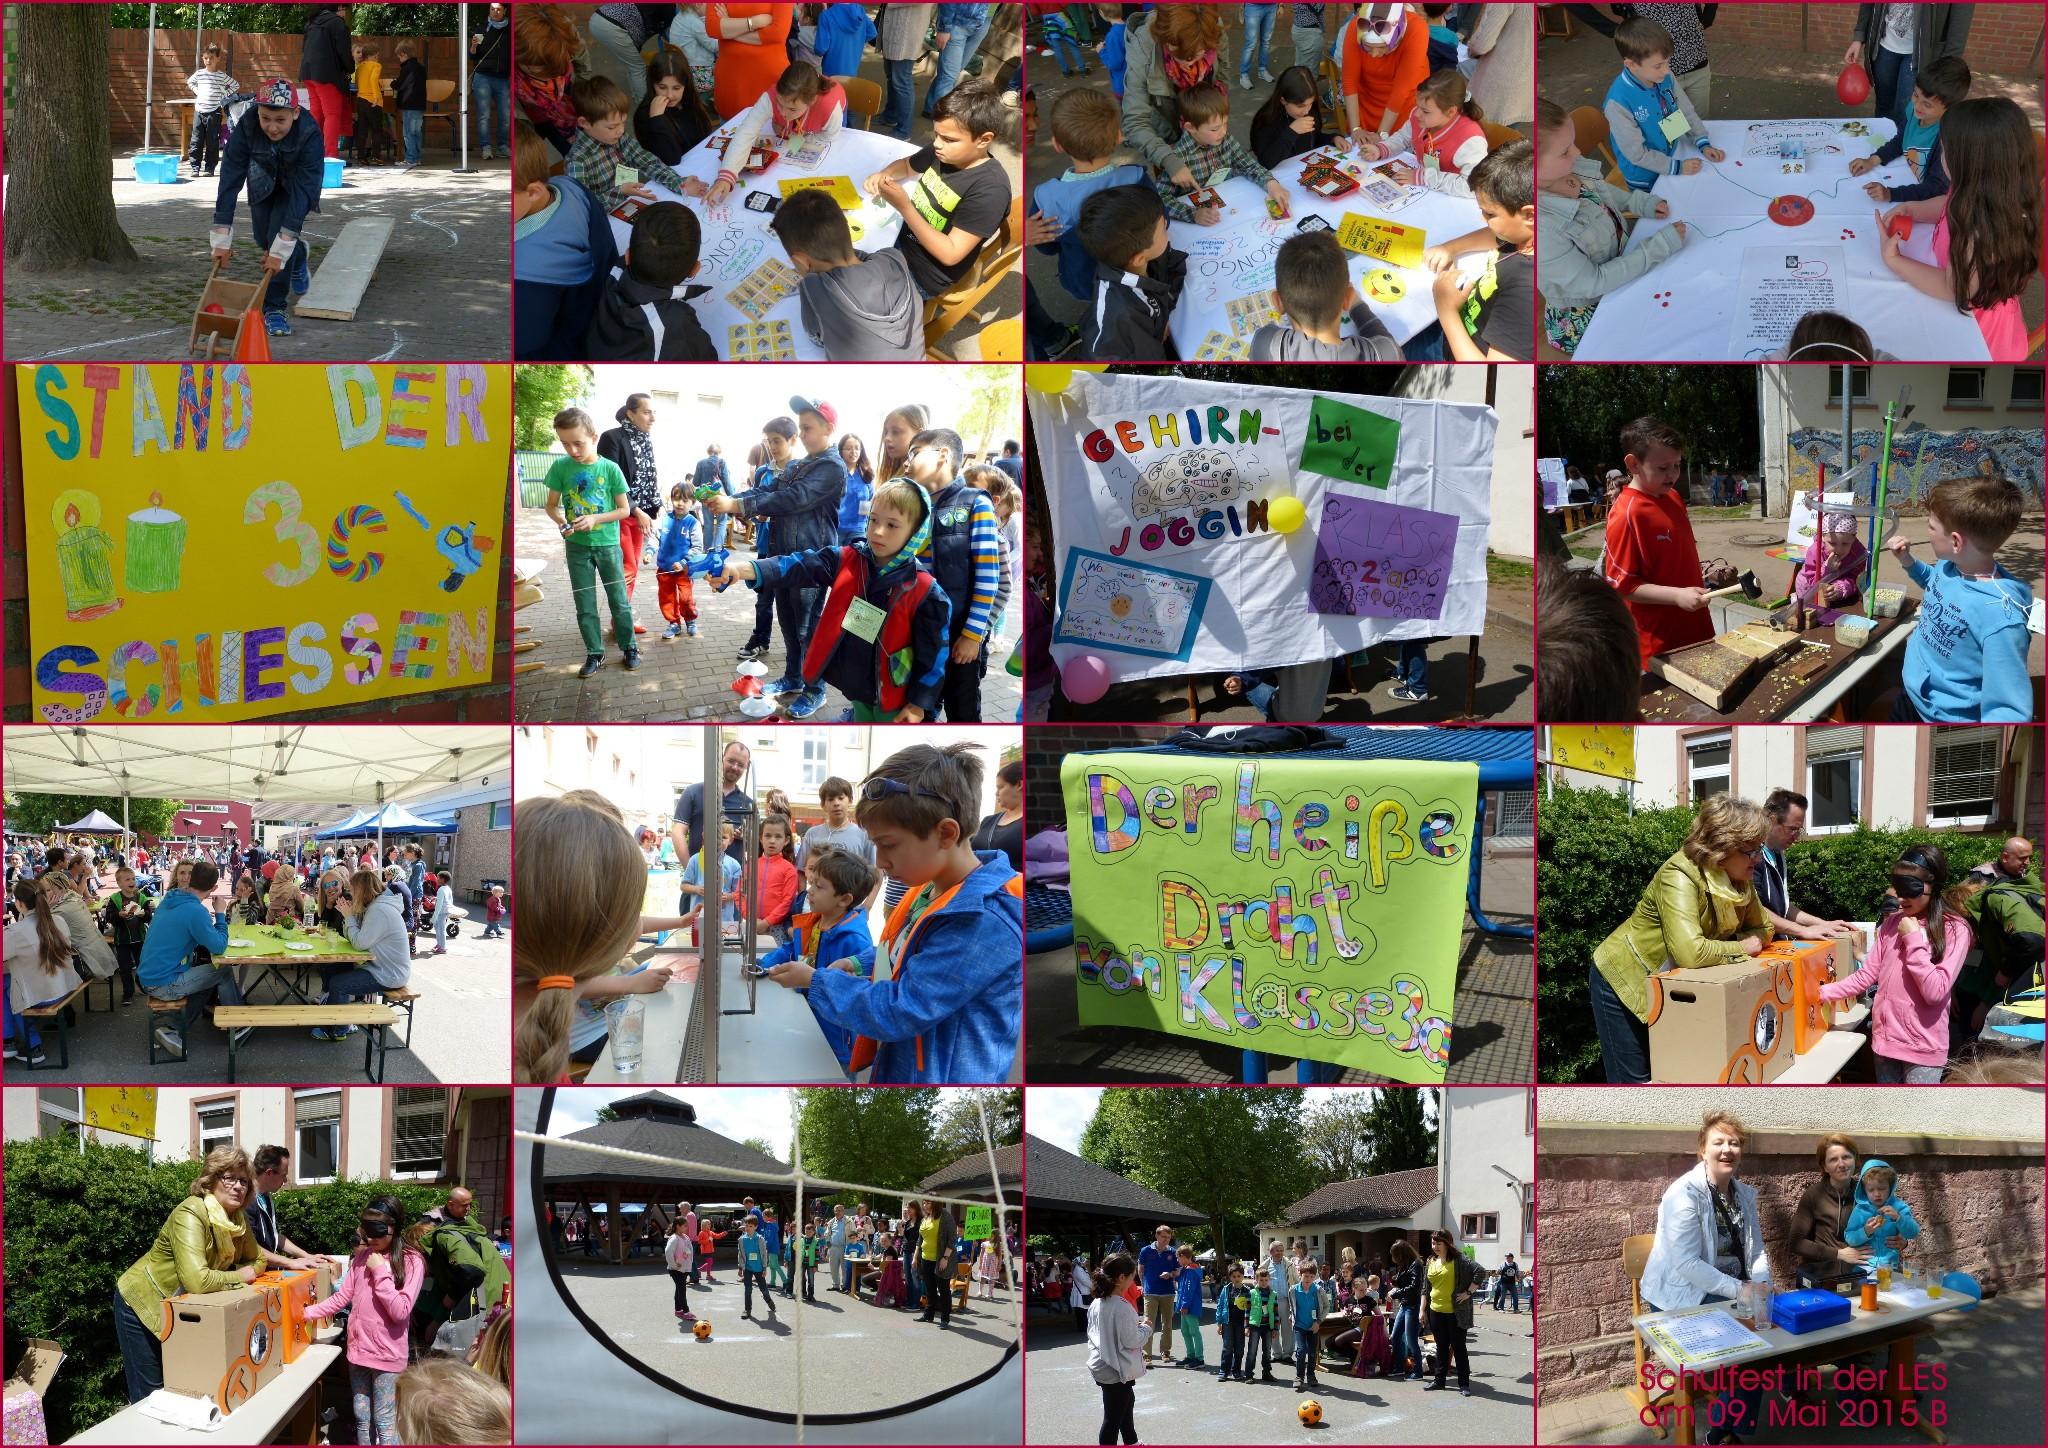 2015-05-09_Schulfest_Coll-kl-B.jpg